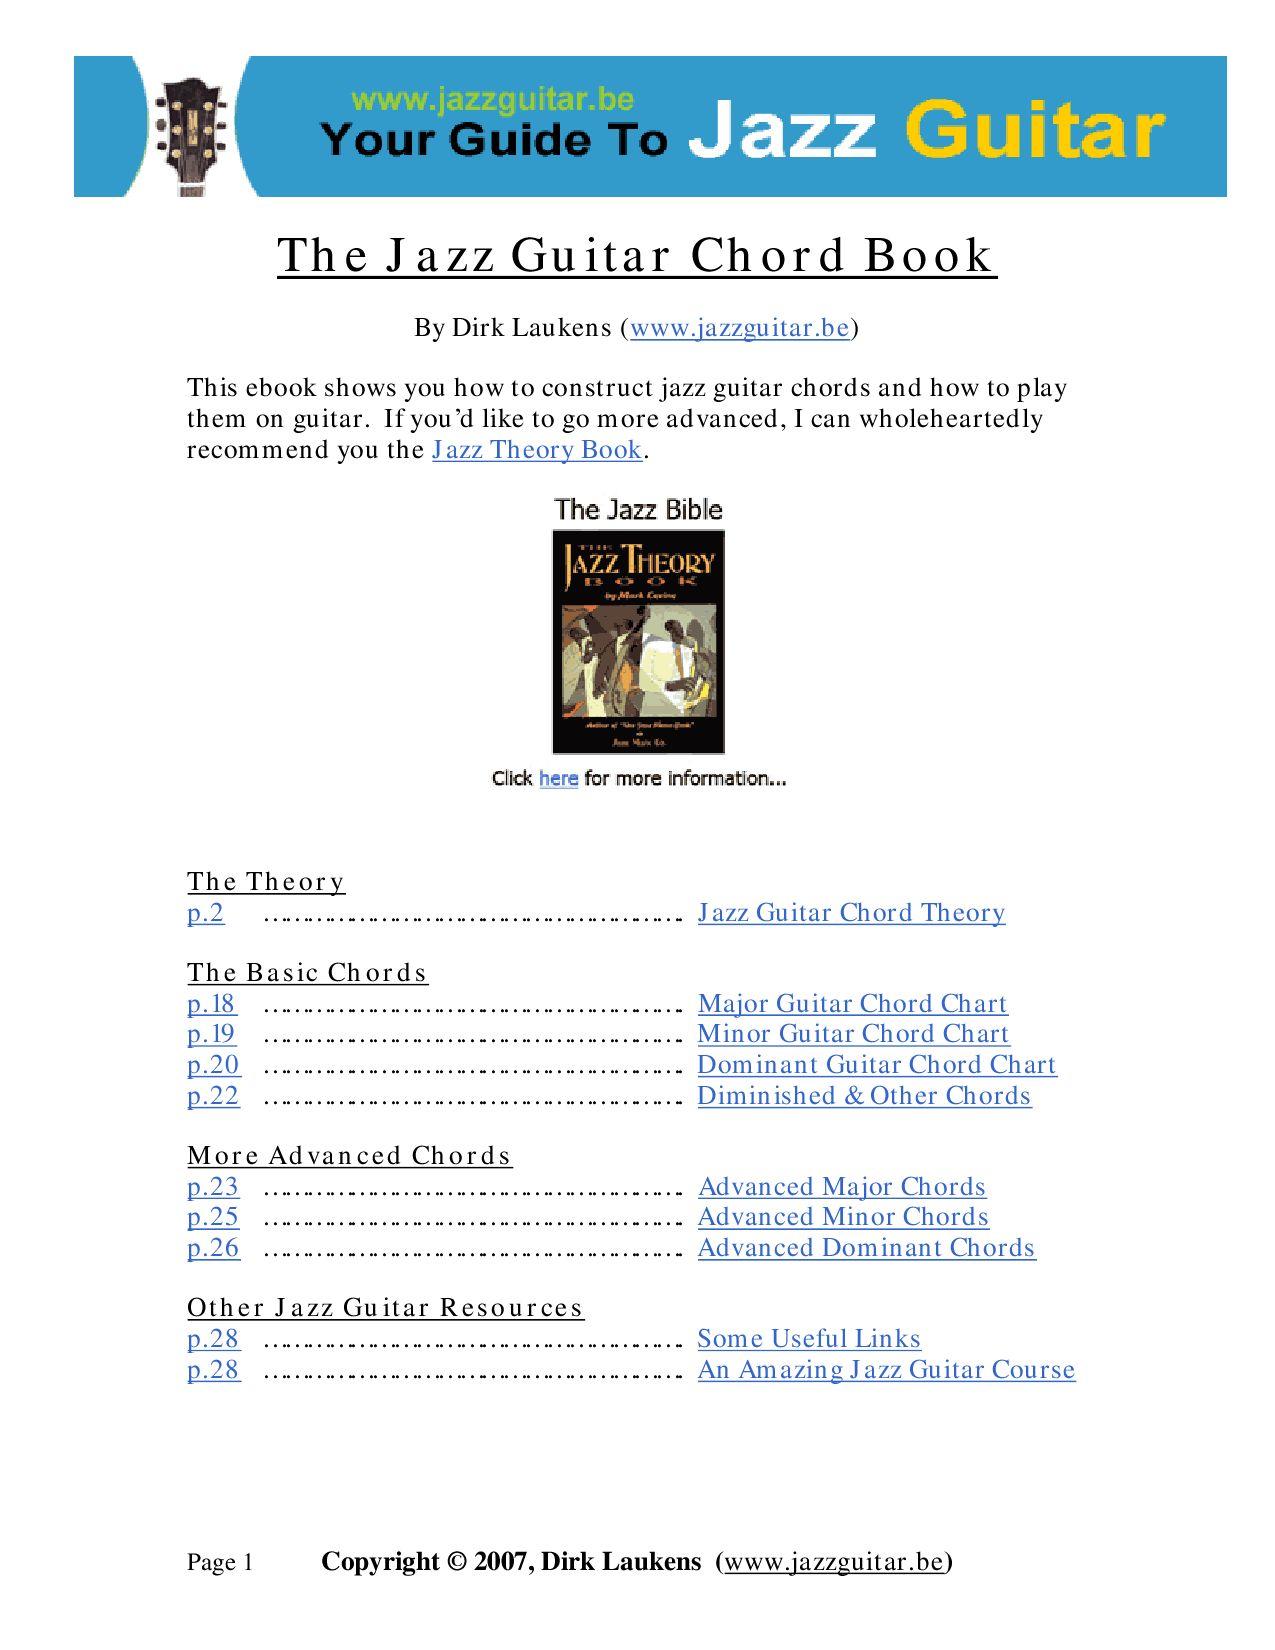 The Jazz Guitar Chords Ebook By Biblioteca Musical Issuu